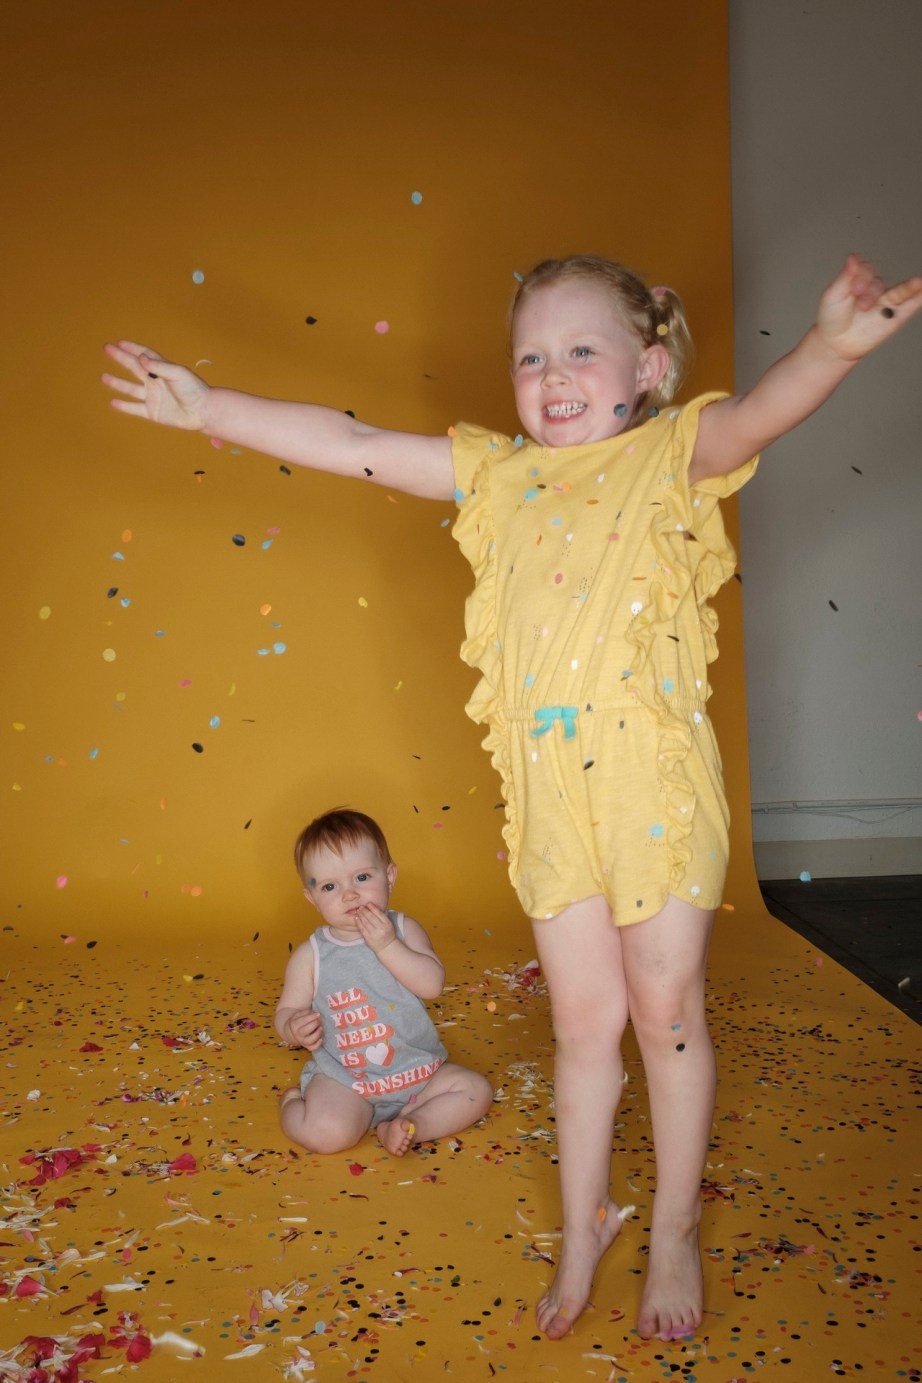 family photography studio orange county nicole caldwell 11